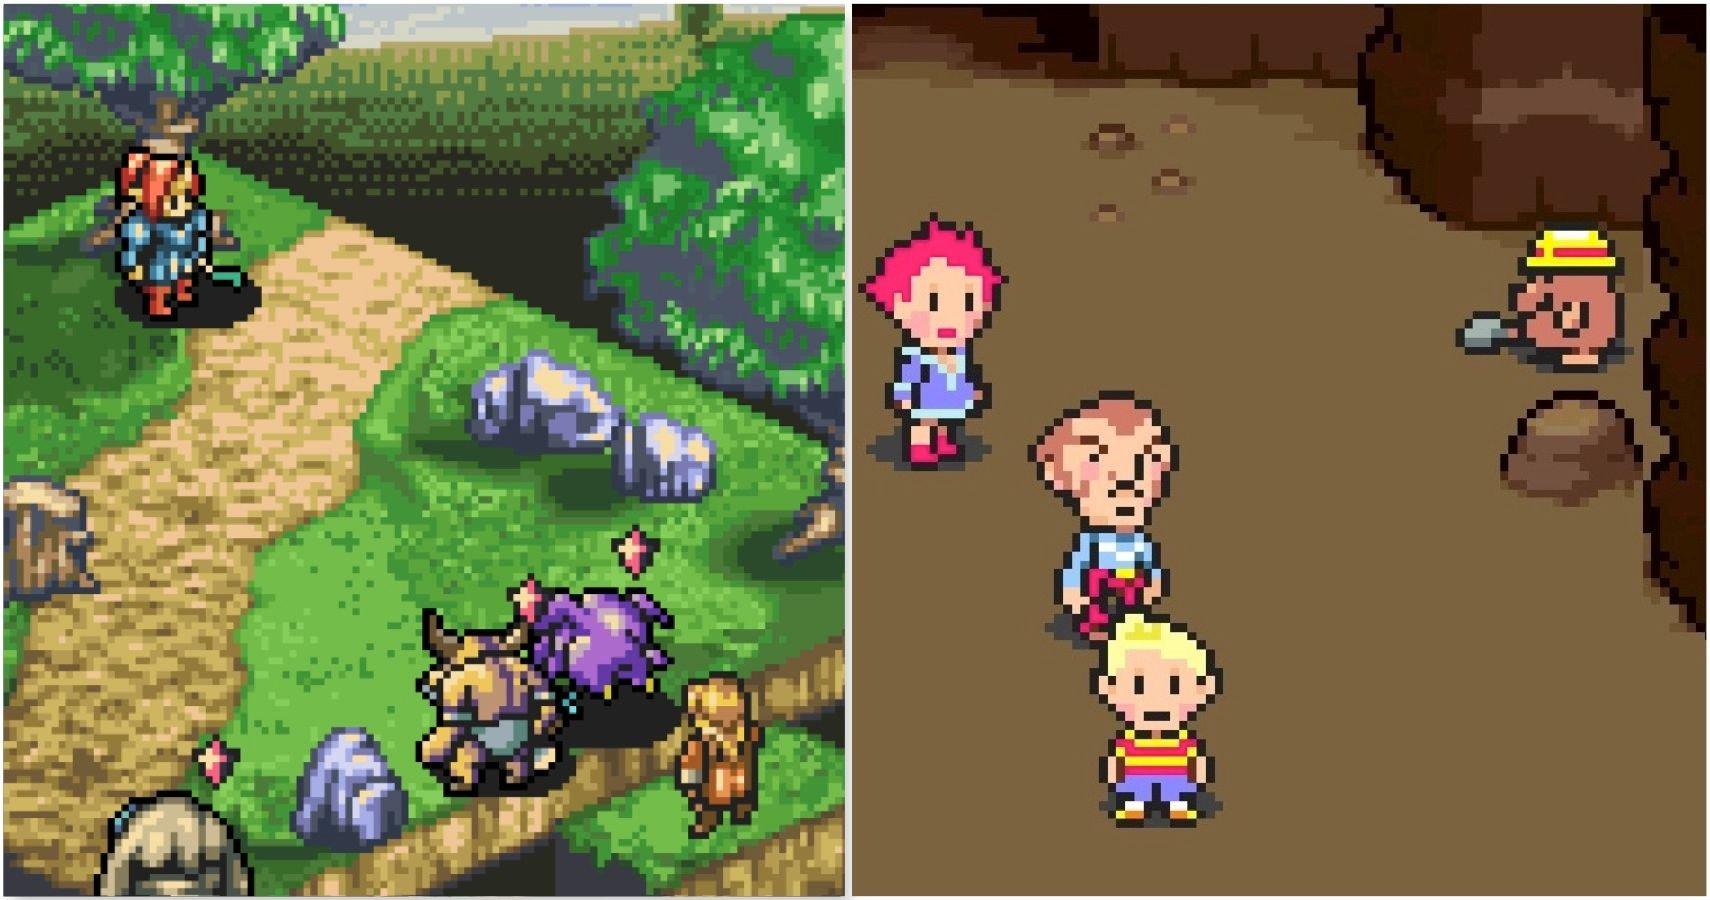 10 Game Boy Advance RPGs That Never Left Japan